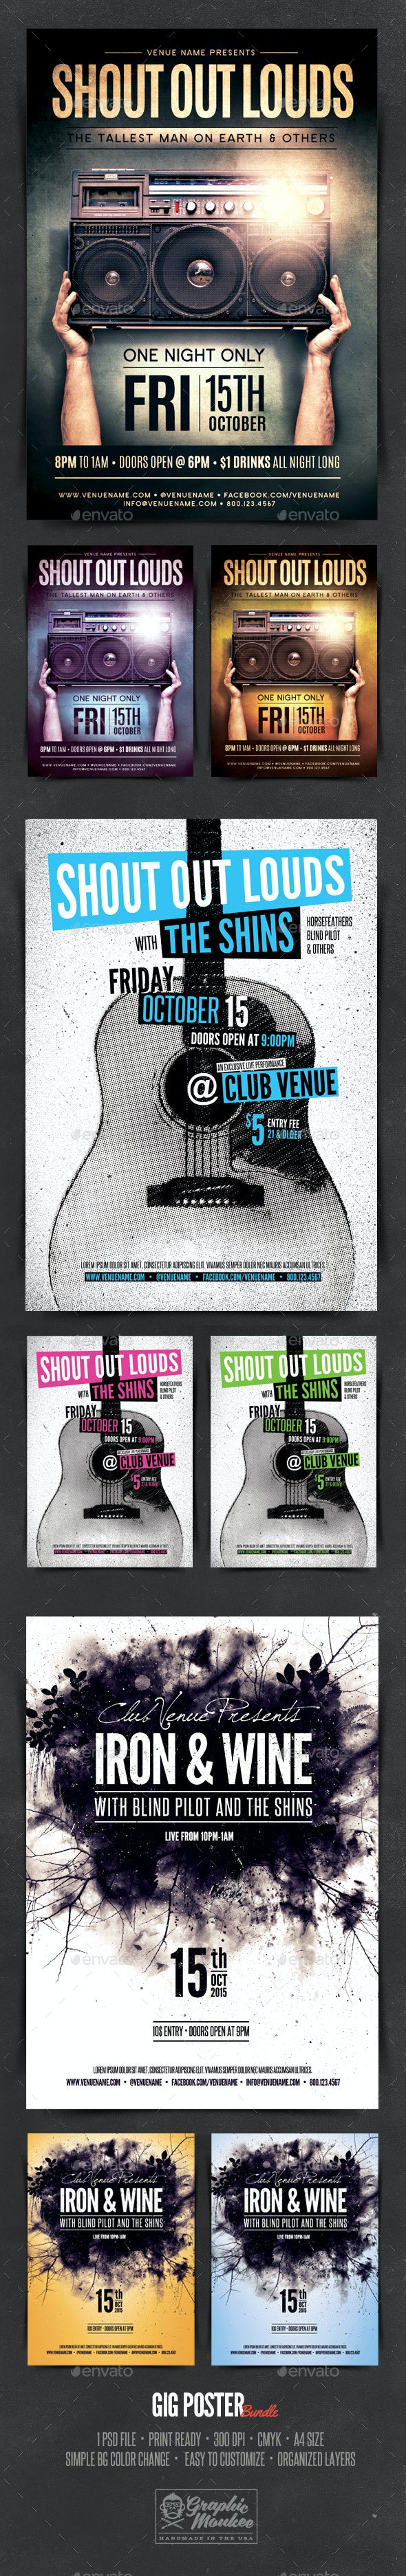 Gig Poster Template - Bundle - Concerts Events